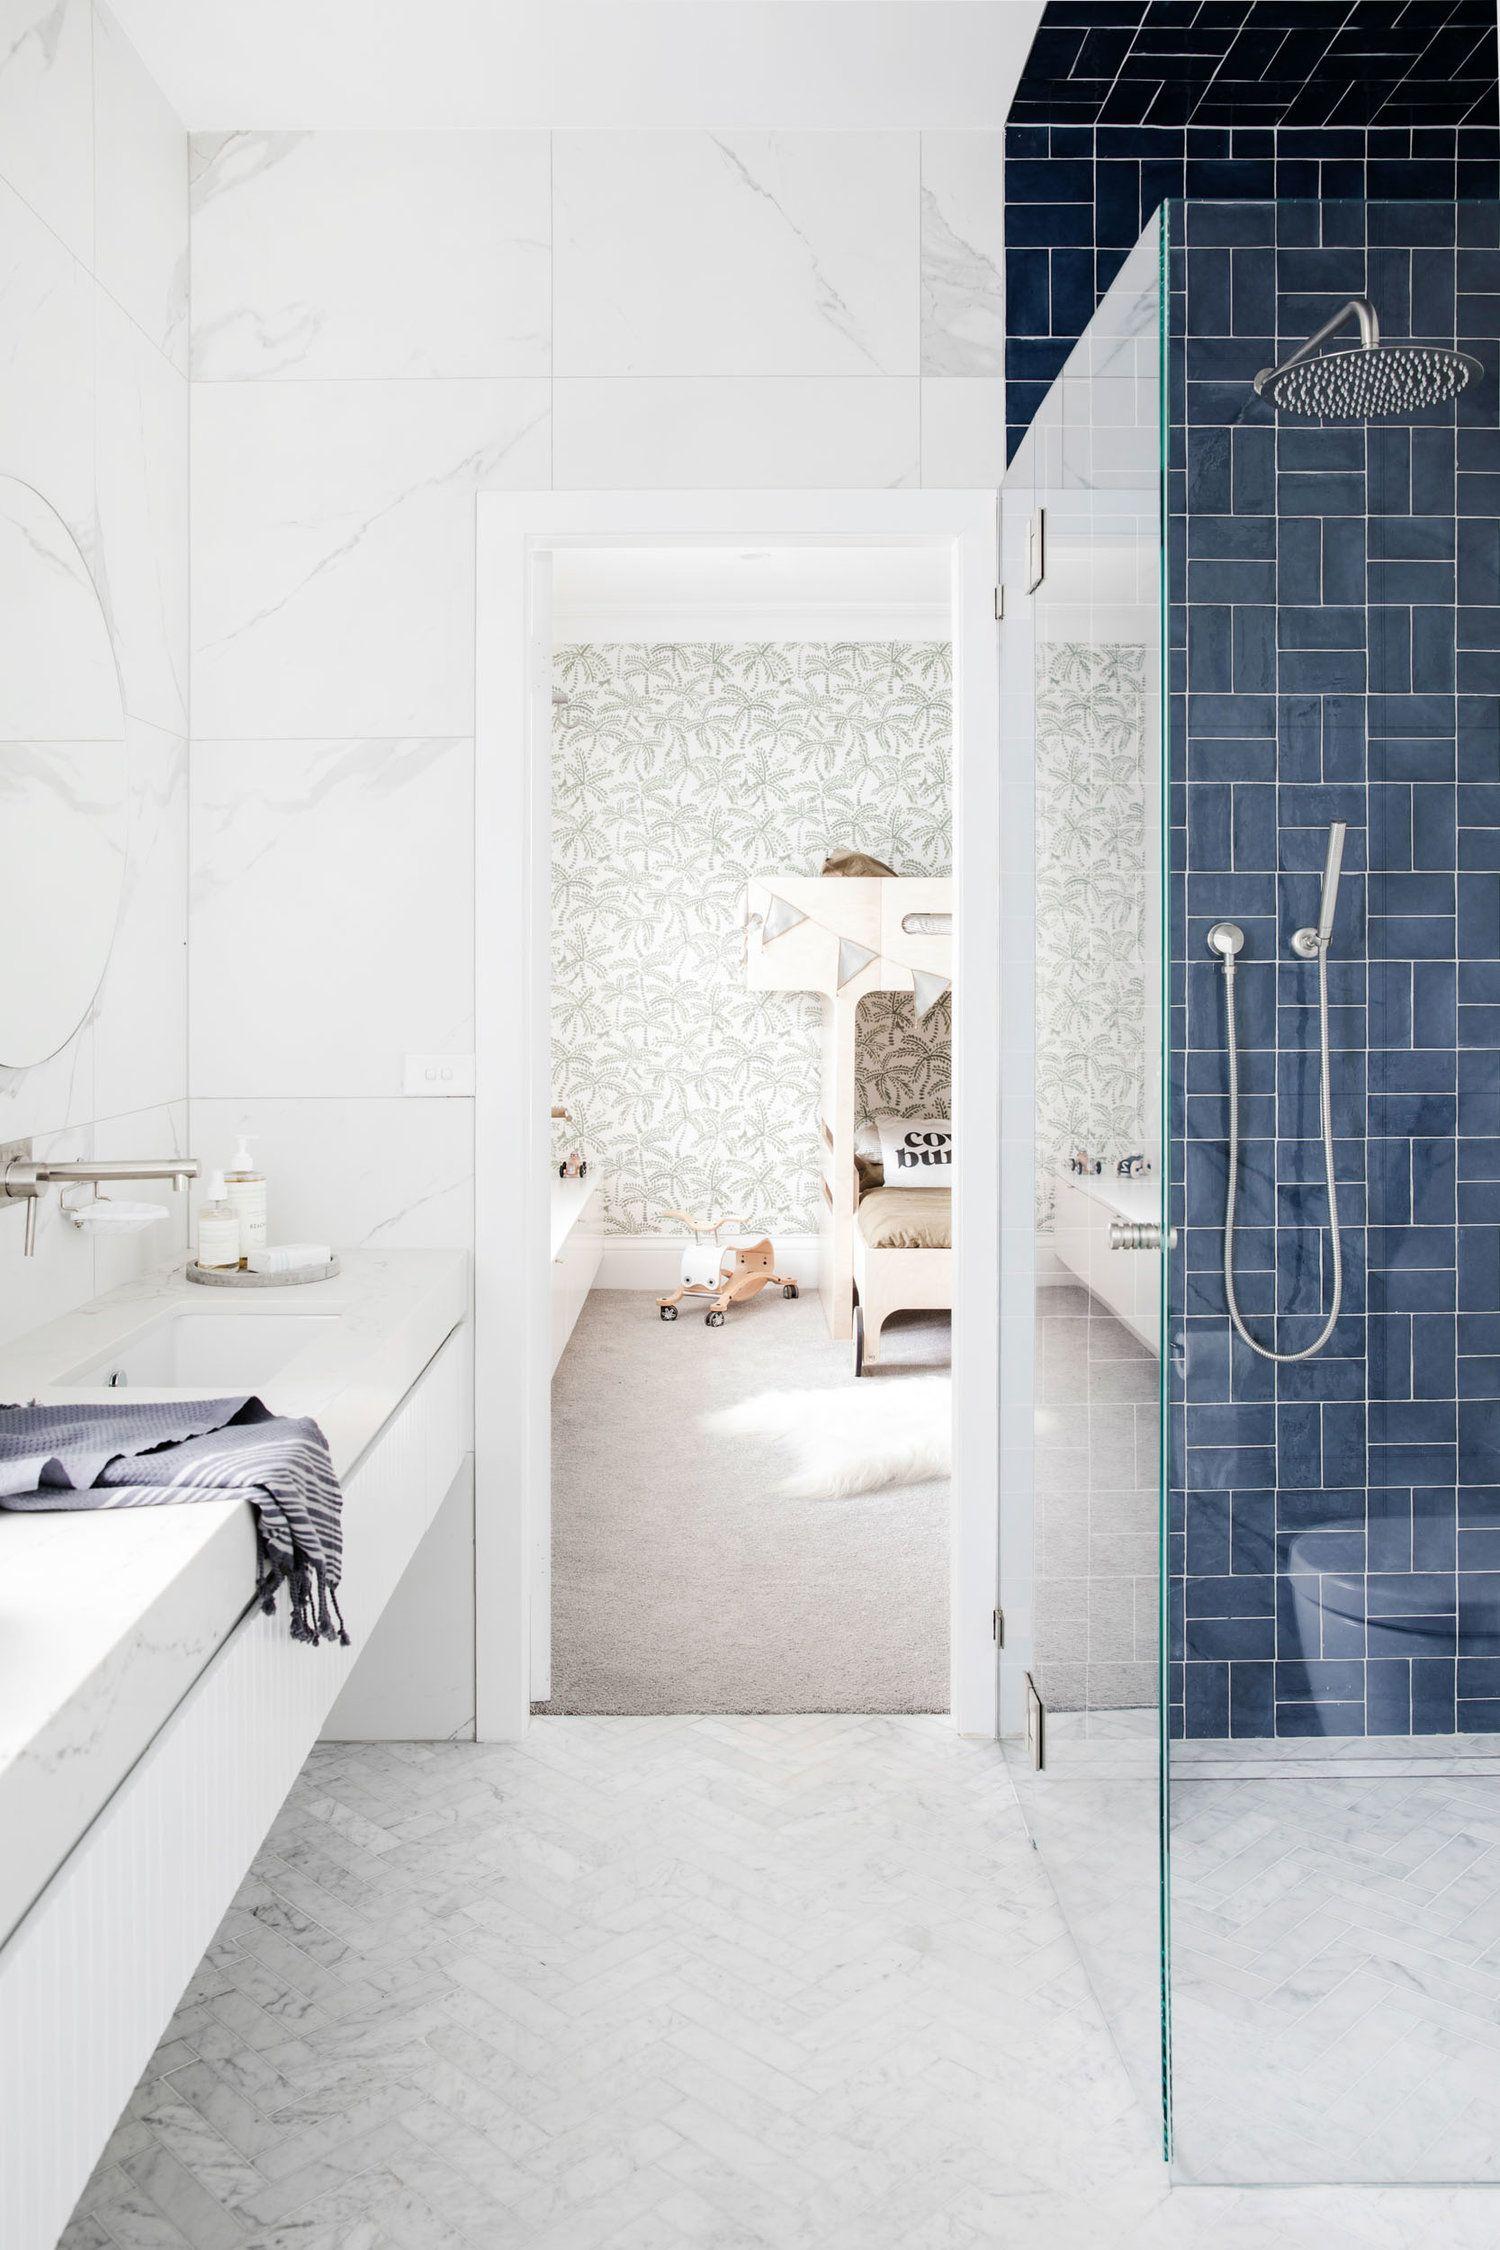 Pin by kiana burchard on decorinterior pinterest bathroom home